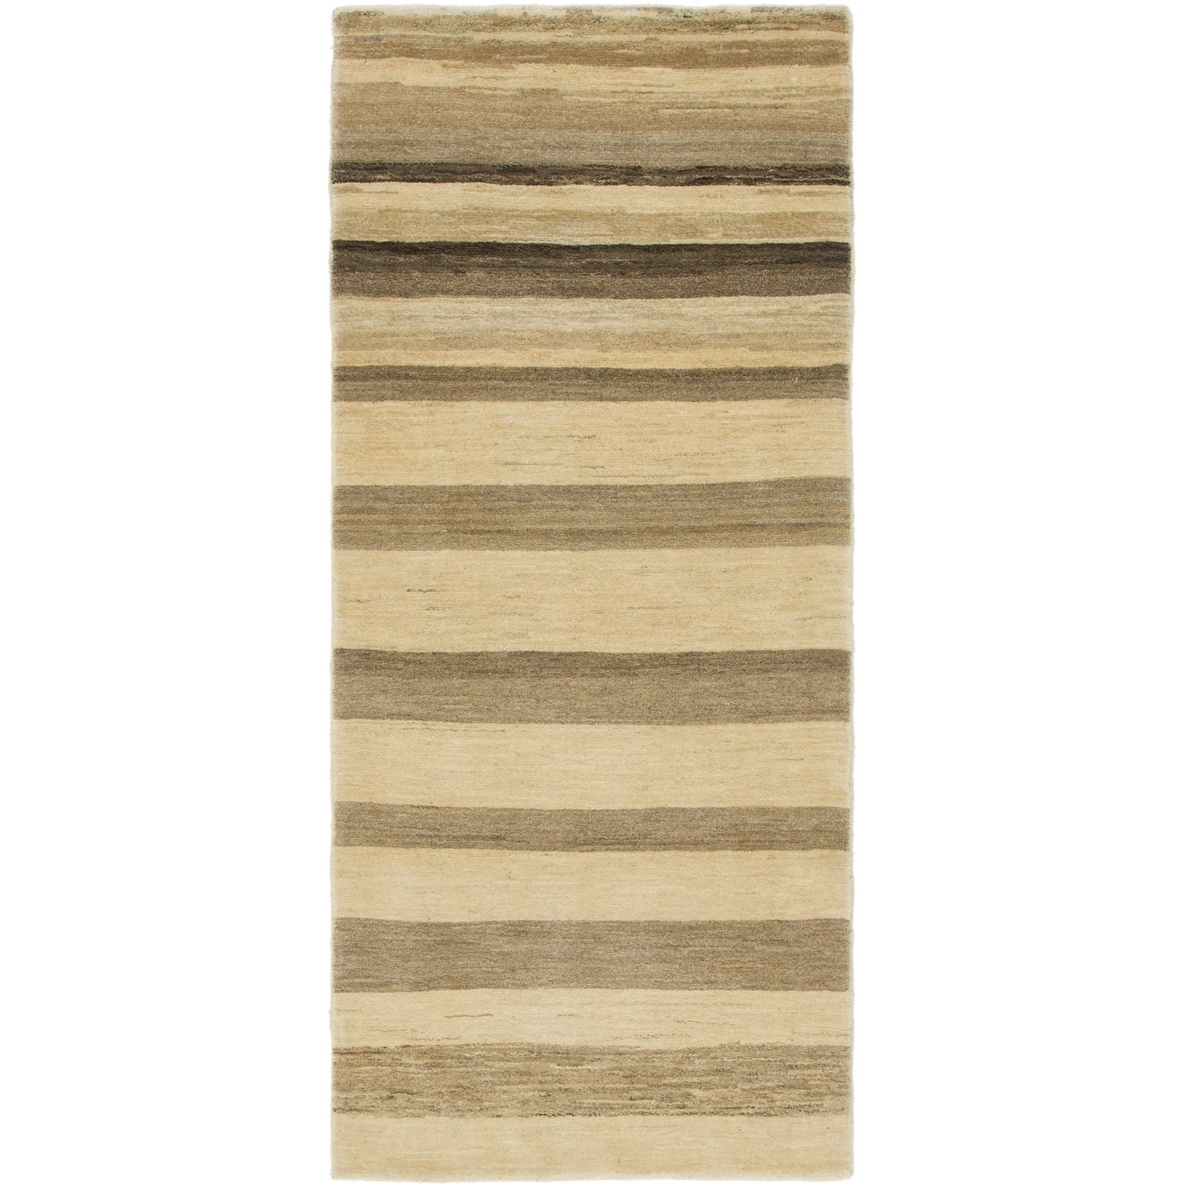 Hand Knotted Kashkuli Gabbeh Wool Runner Rug - 2 10 x 6 7 (Cream - 2 10 x 6 7)